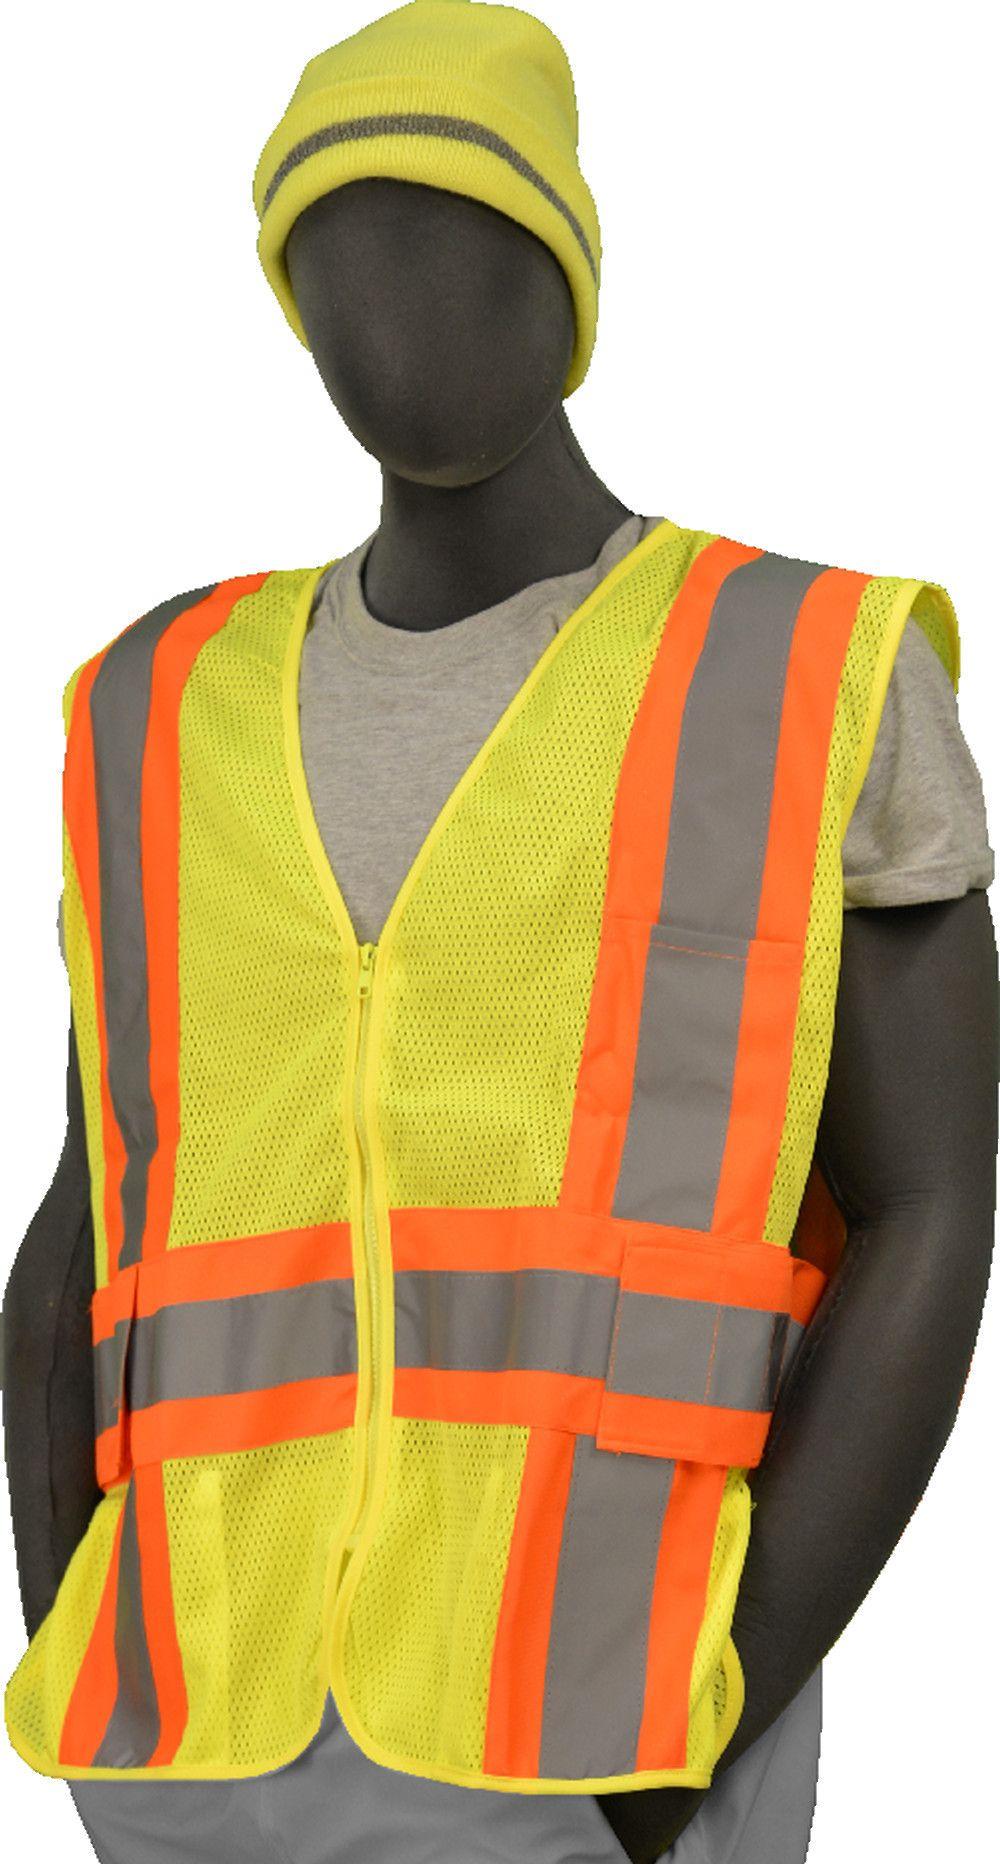 Safety Apparel Customization Safety vest, Heavy clothing